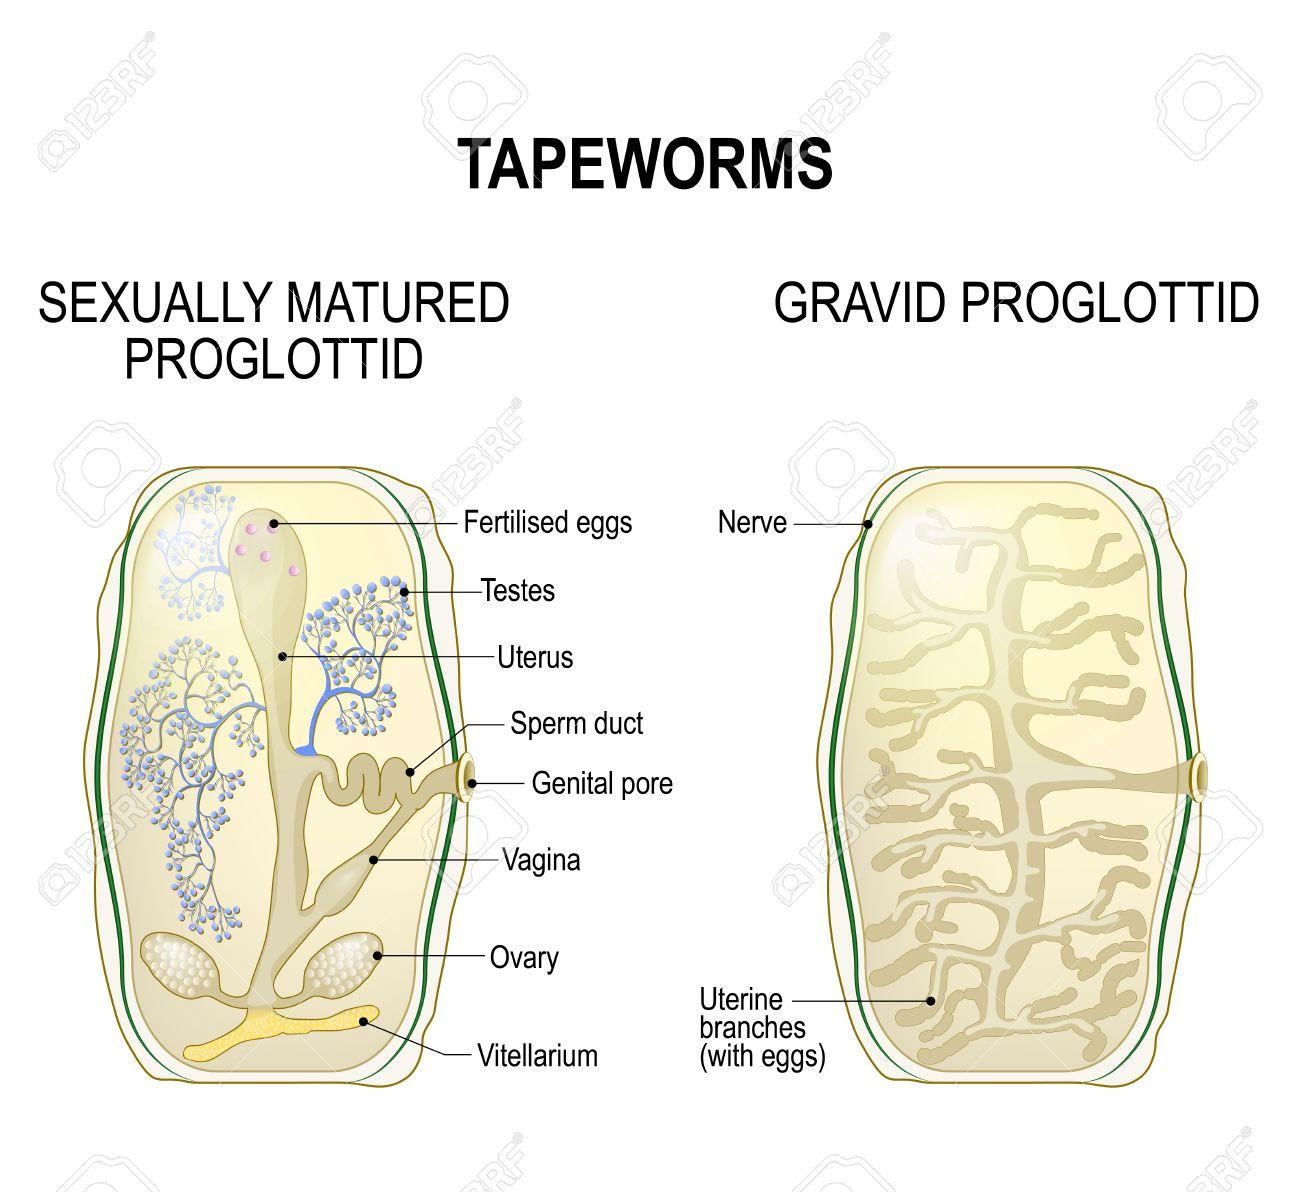 Proglottid Of Taperworms Sexually Mature Proglottid And Gravid